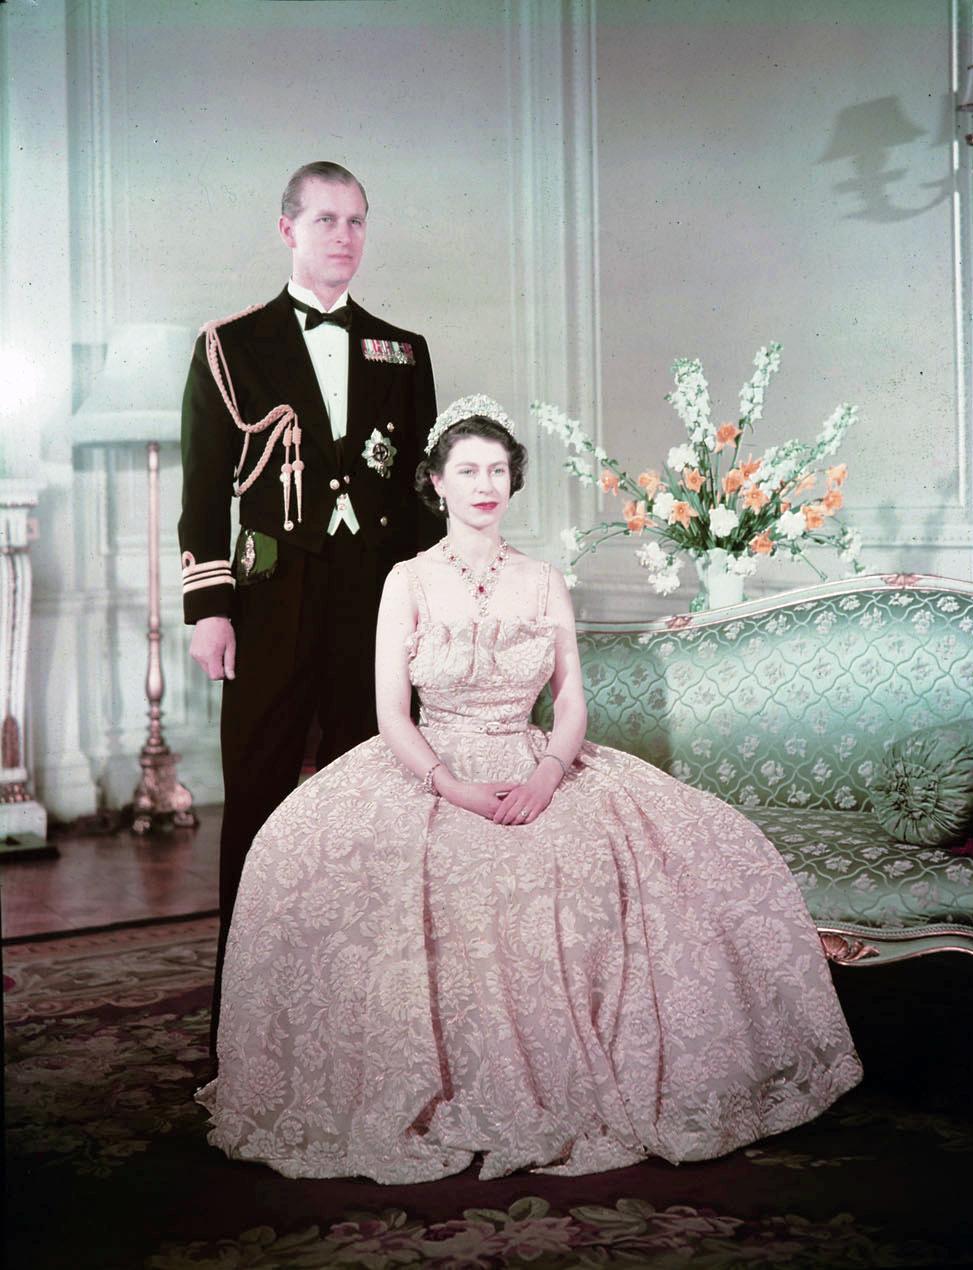 Elizabeth_II_and_Philip.jpg